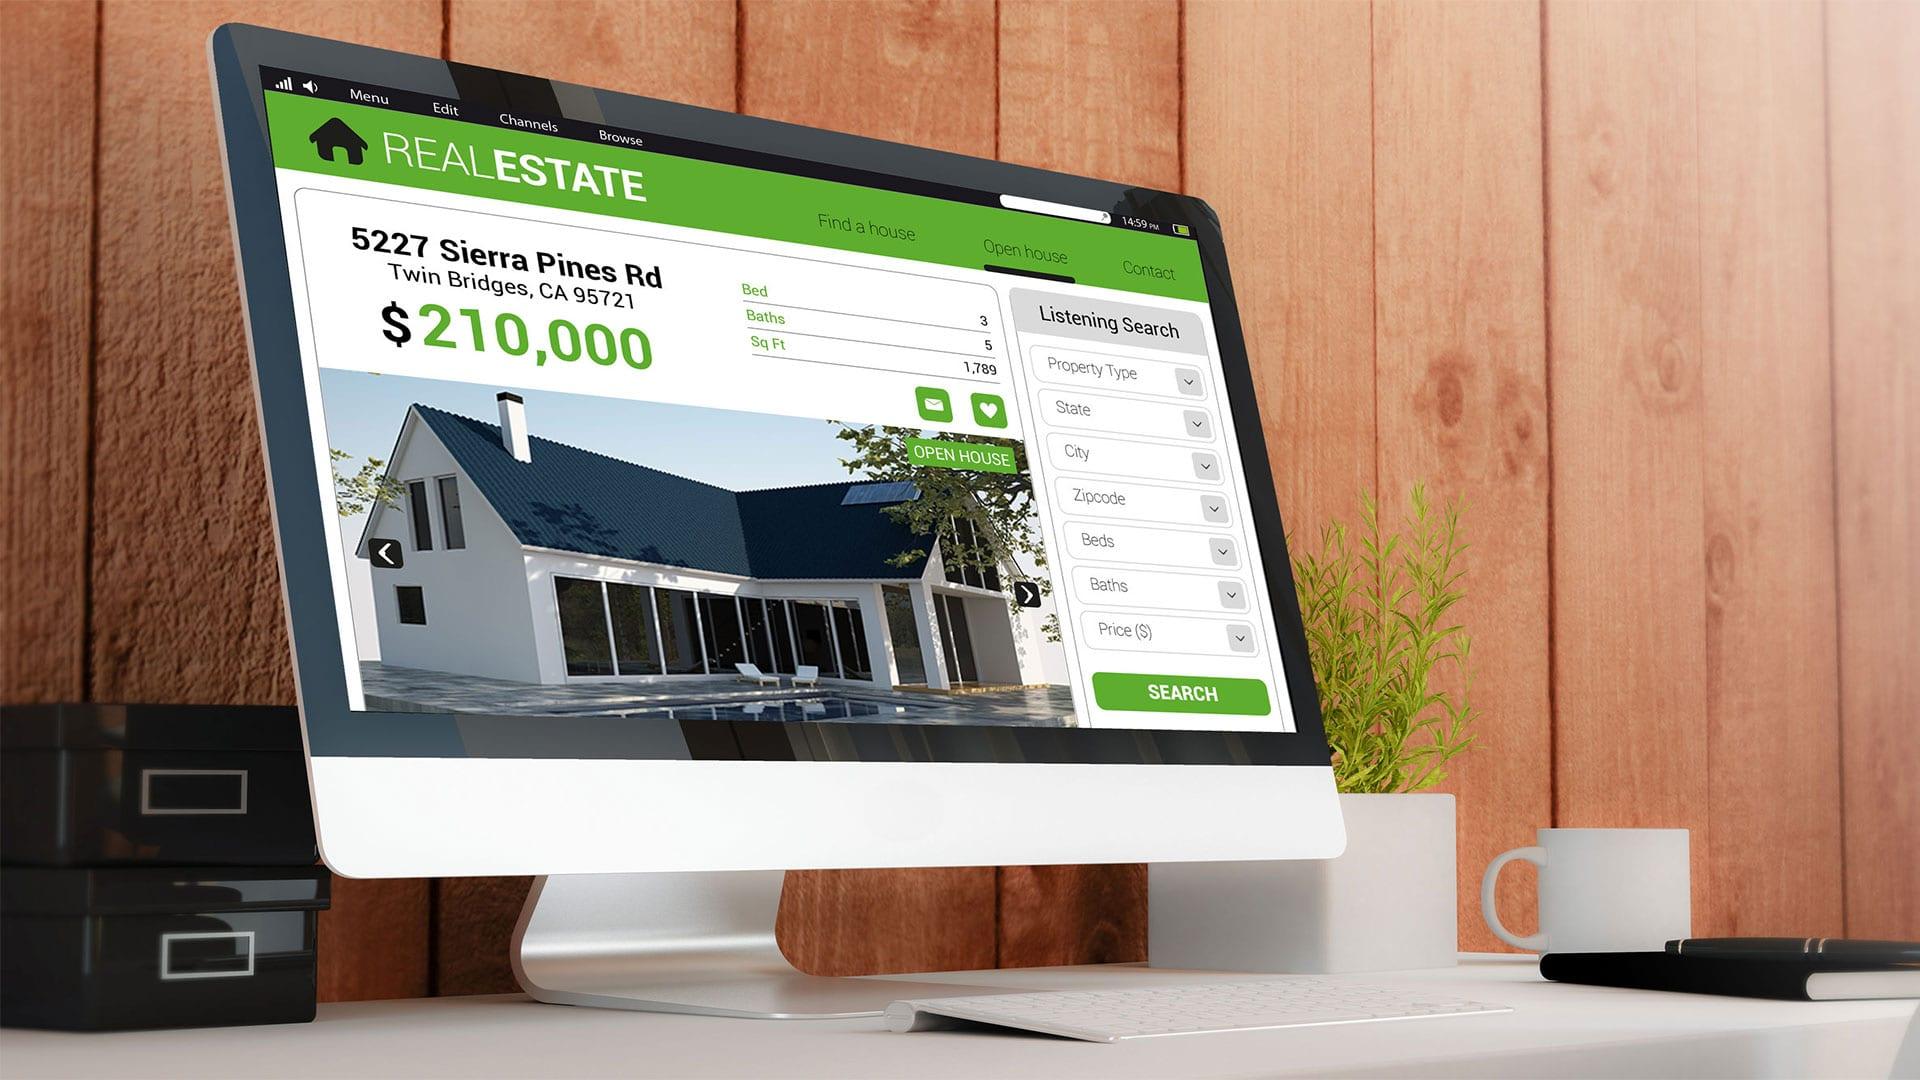 big data, real estate, mortgages